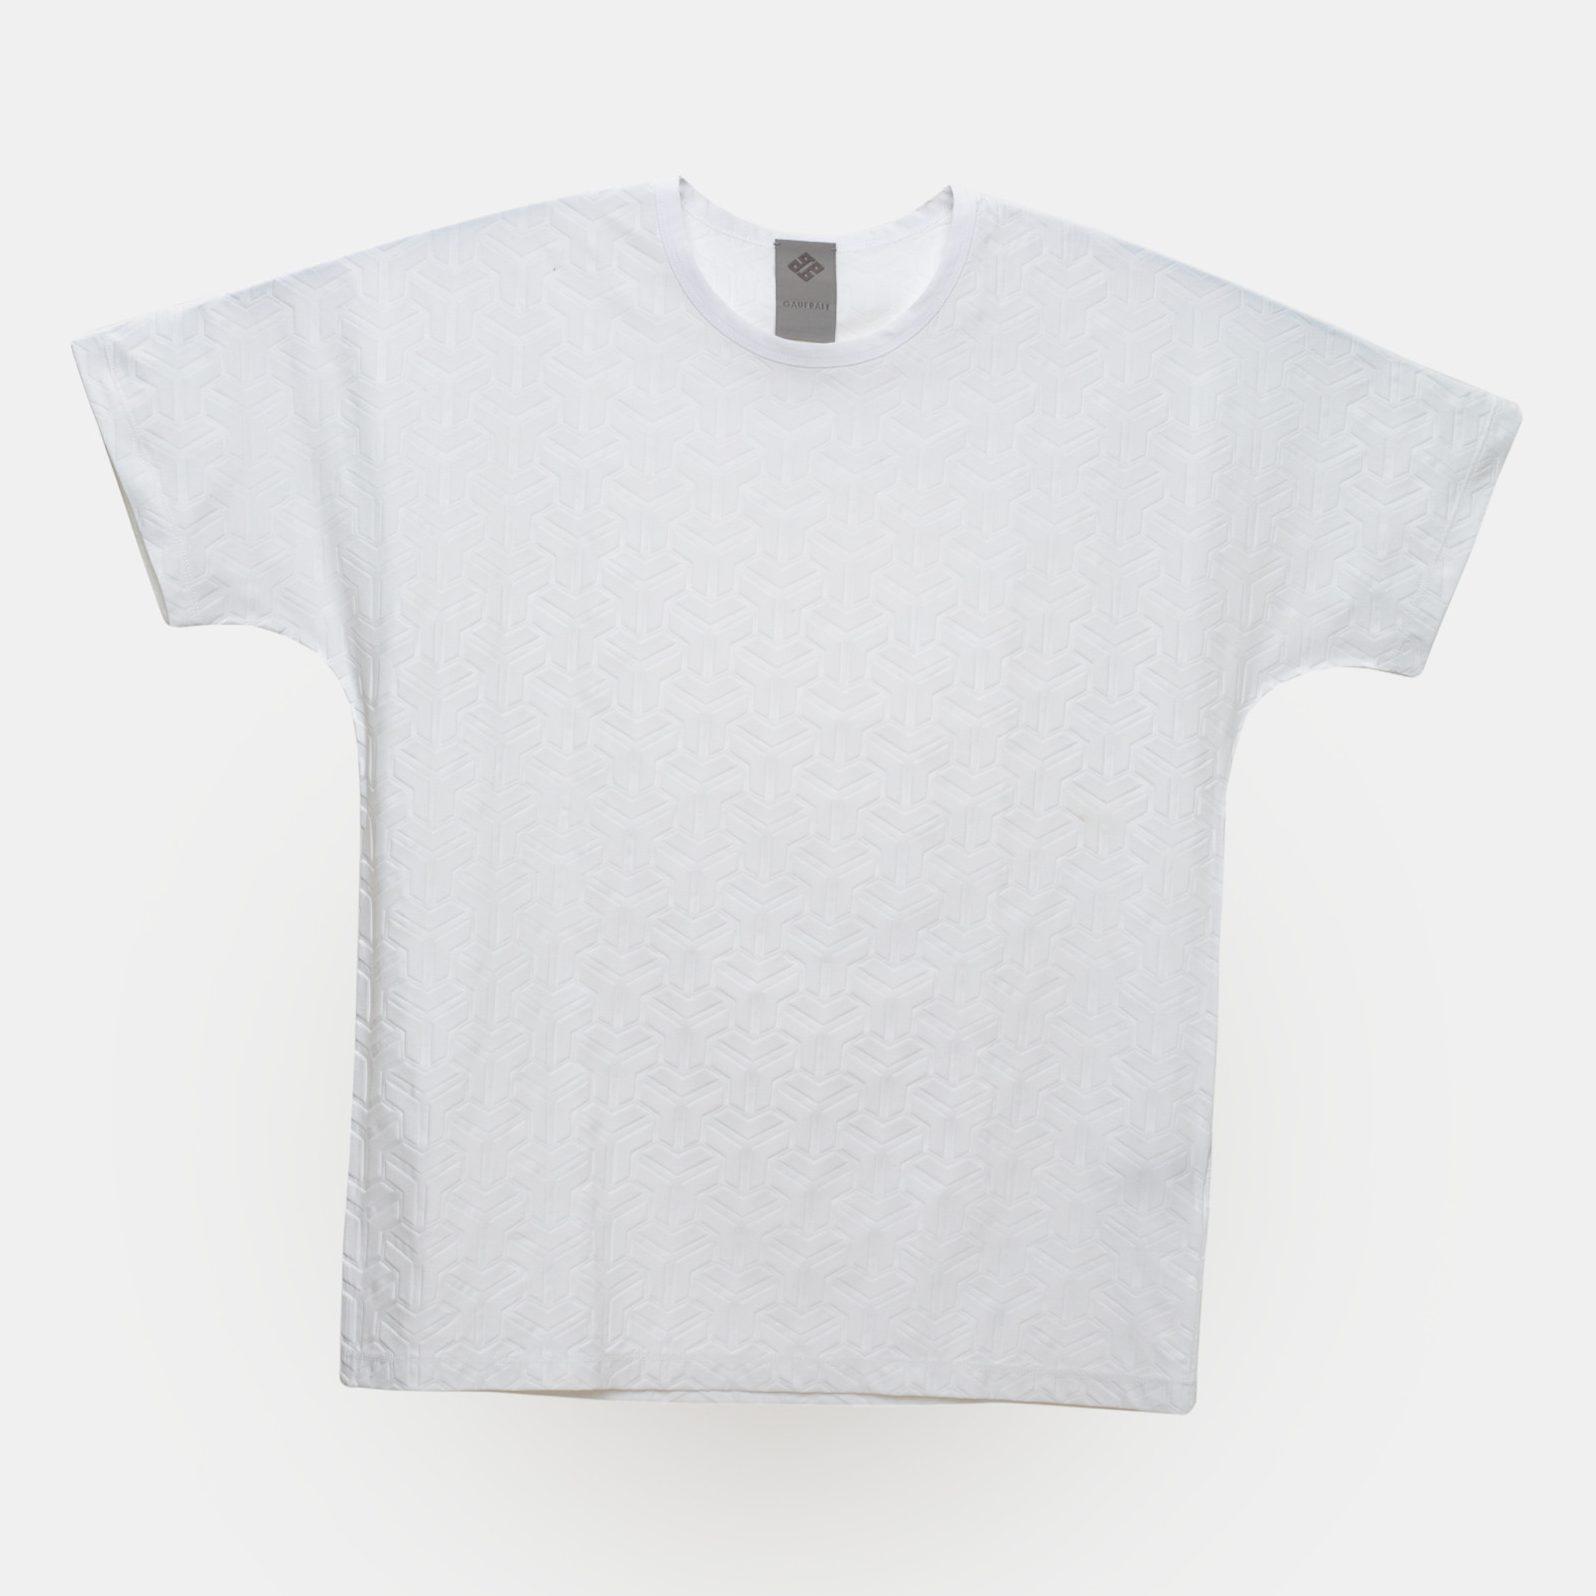 GF53 white / cube